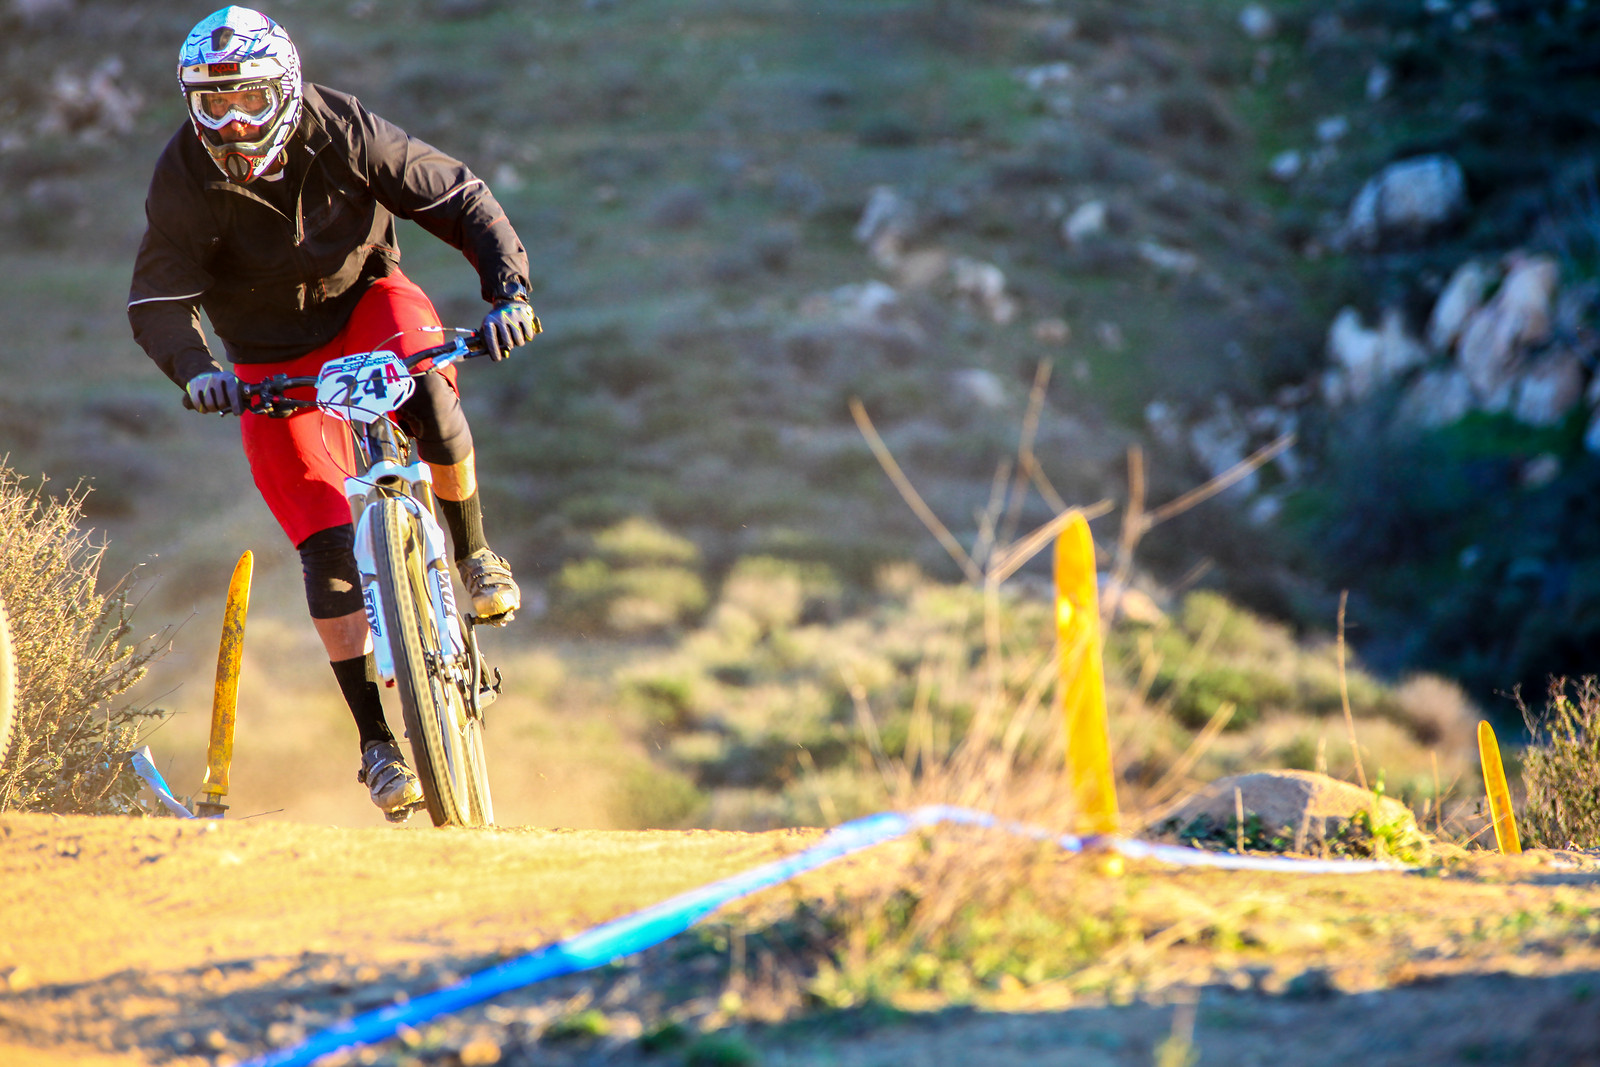 IMG 1715 - GnarHuck - Mountain Biking Pictures - Vital MTB